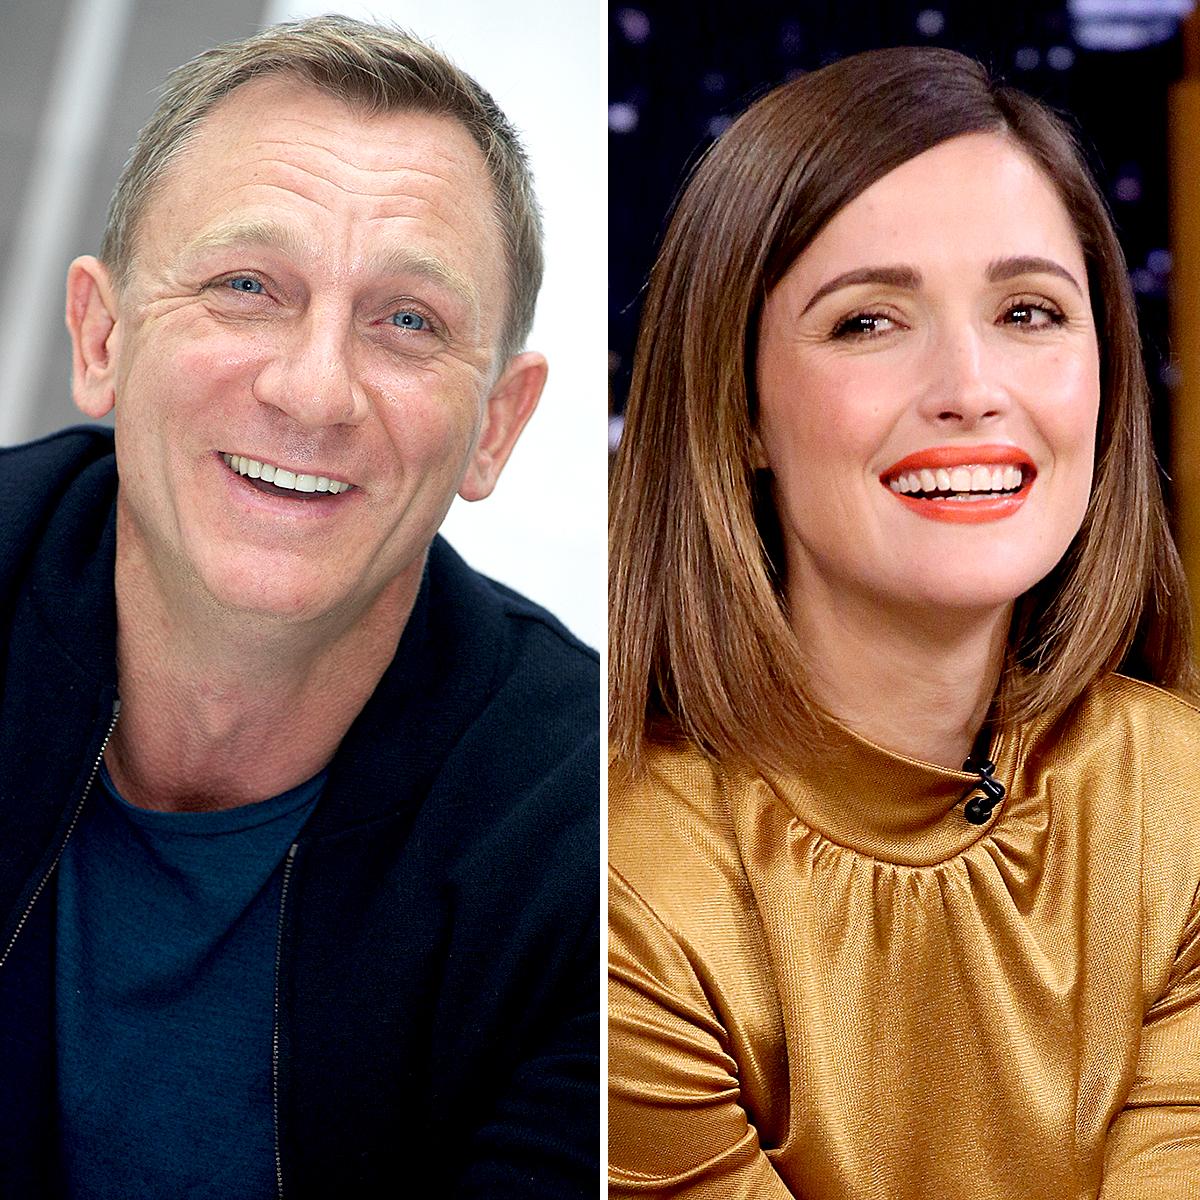 Daniel-Craig-Rose-Byrne-Star-Wars